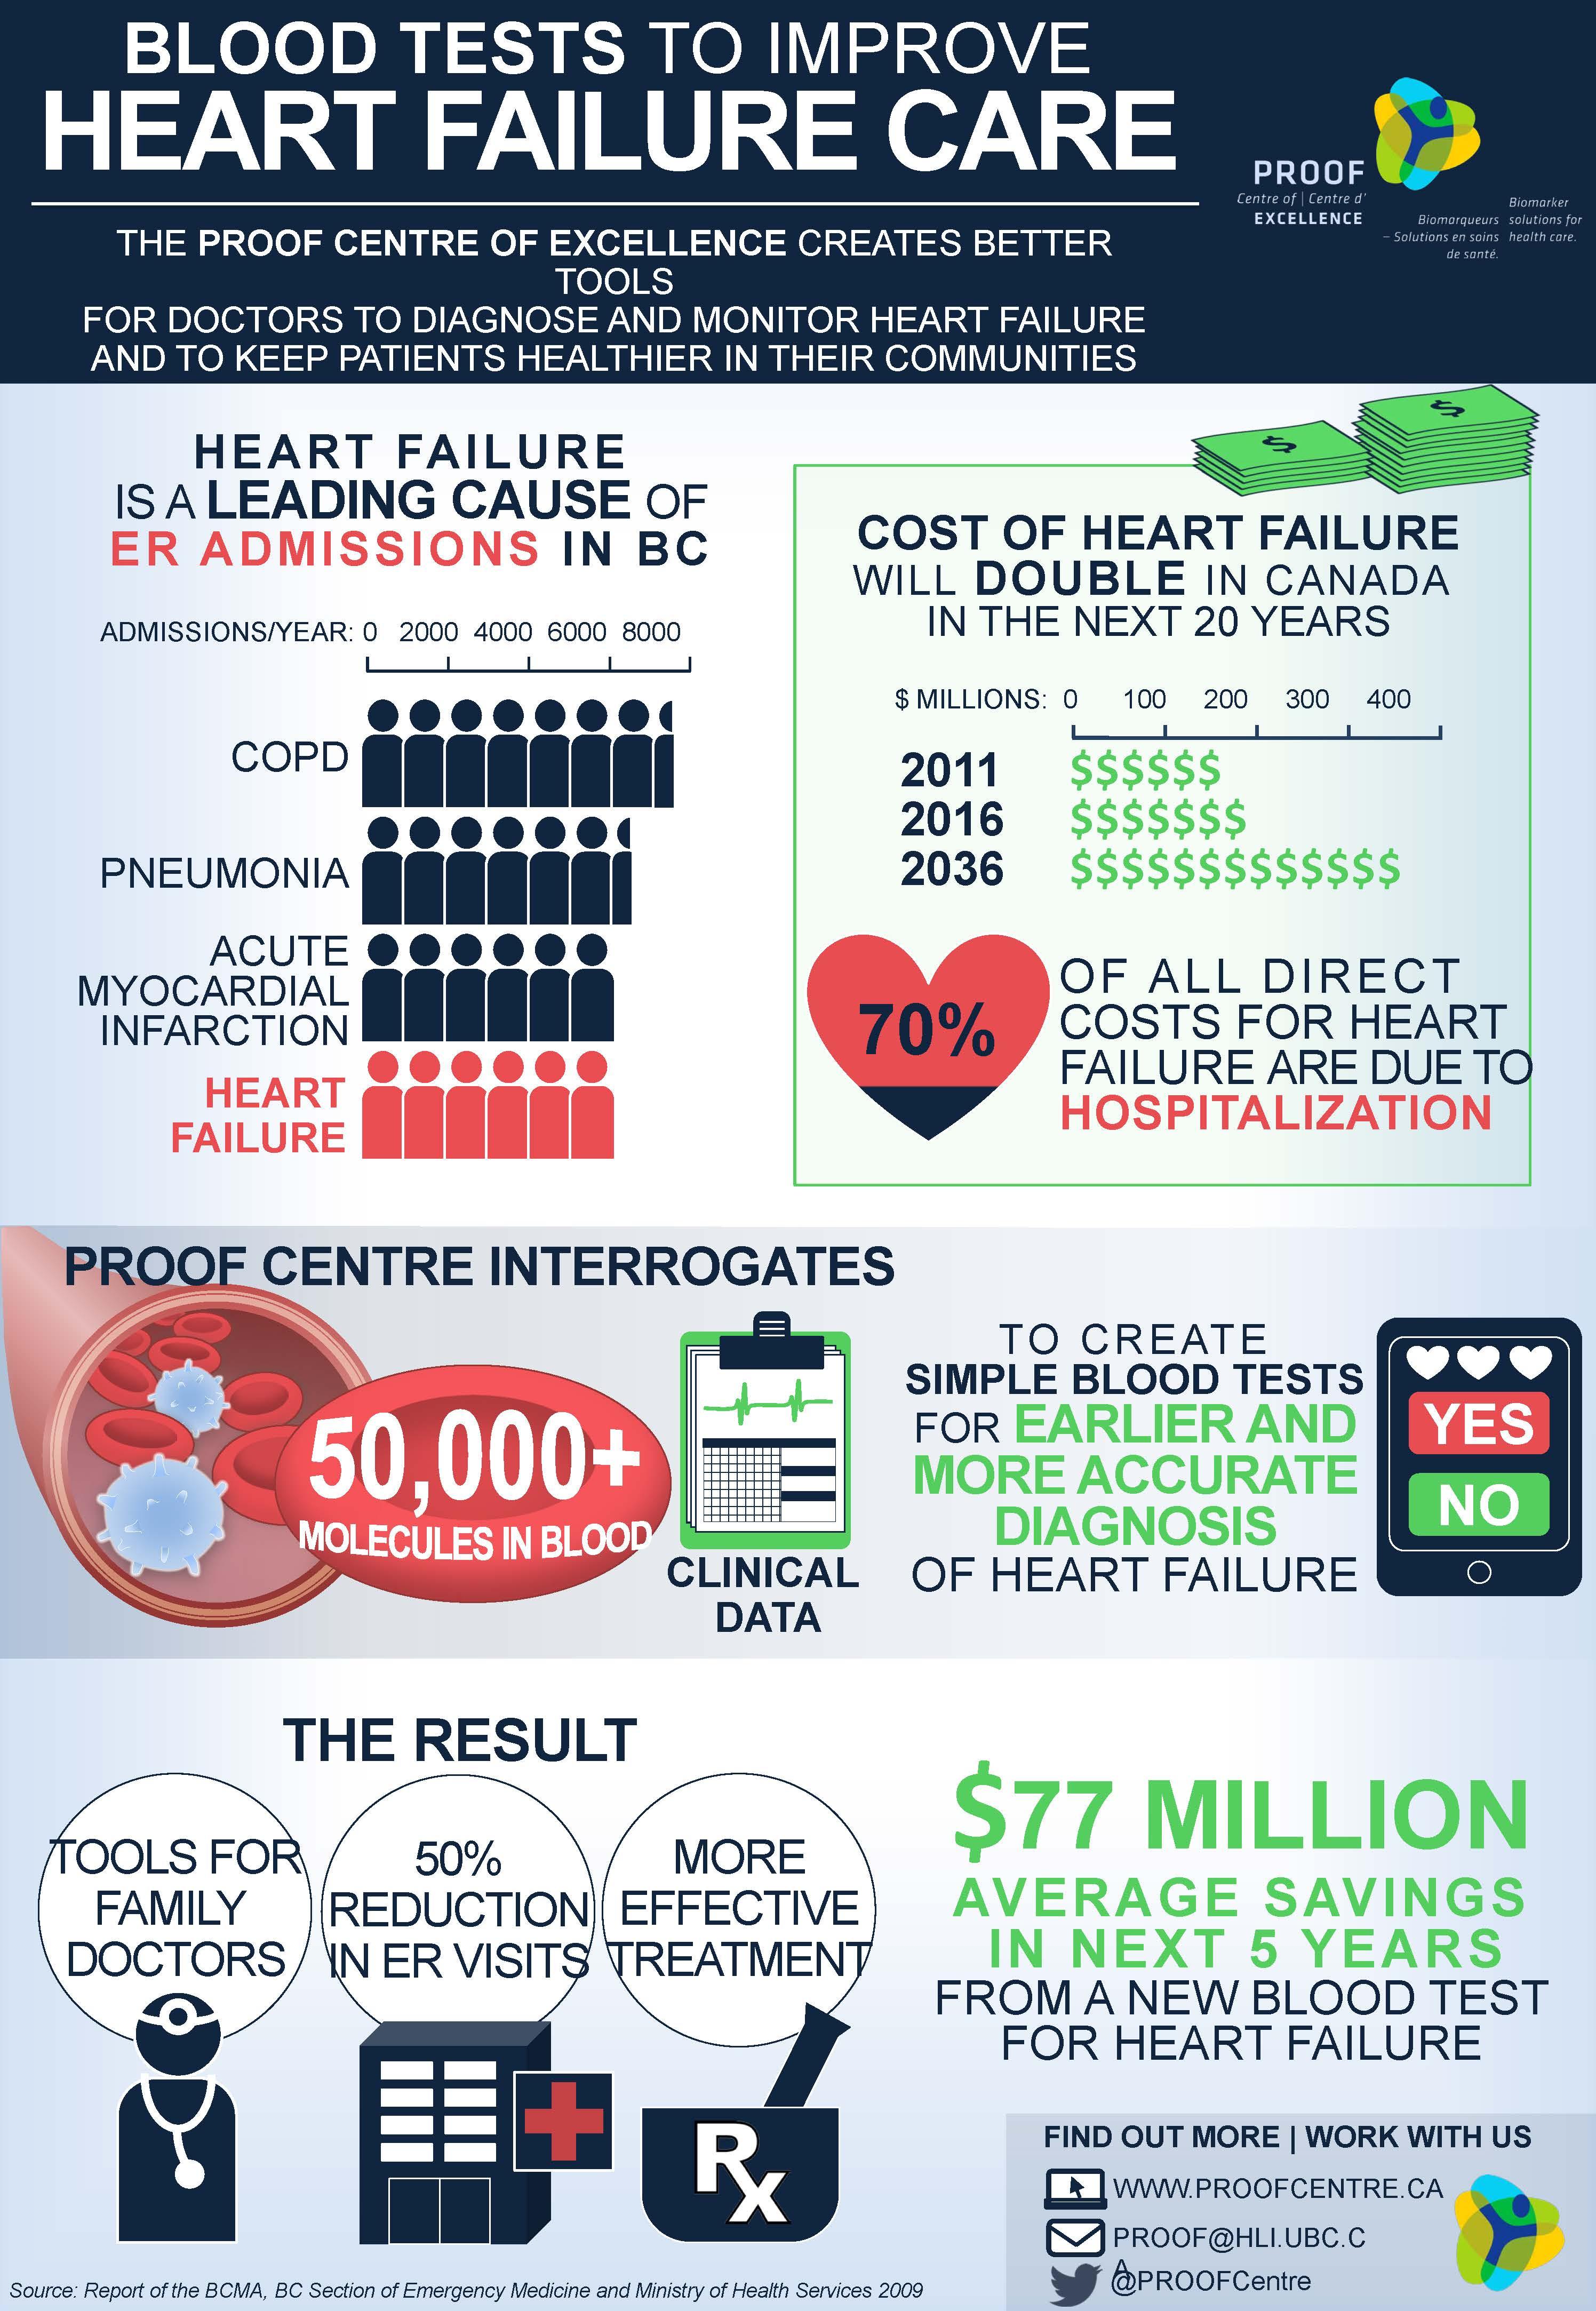 HF Infographic 20140930